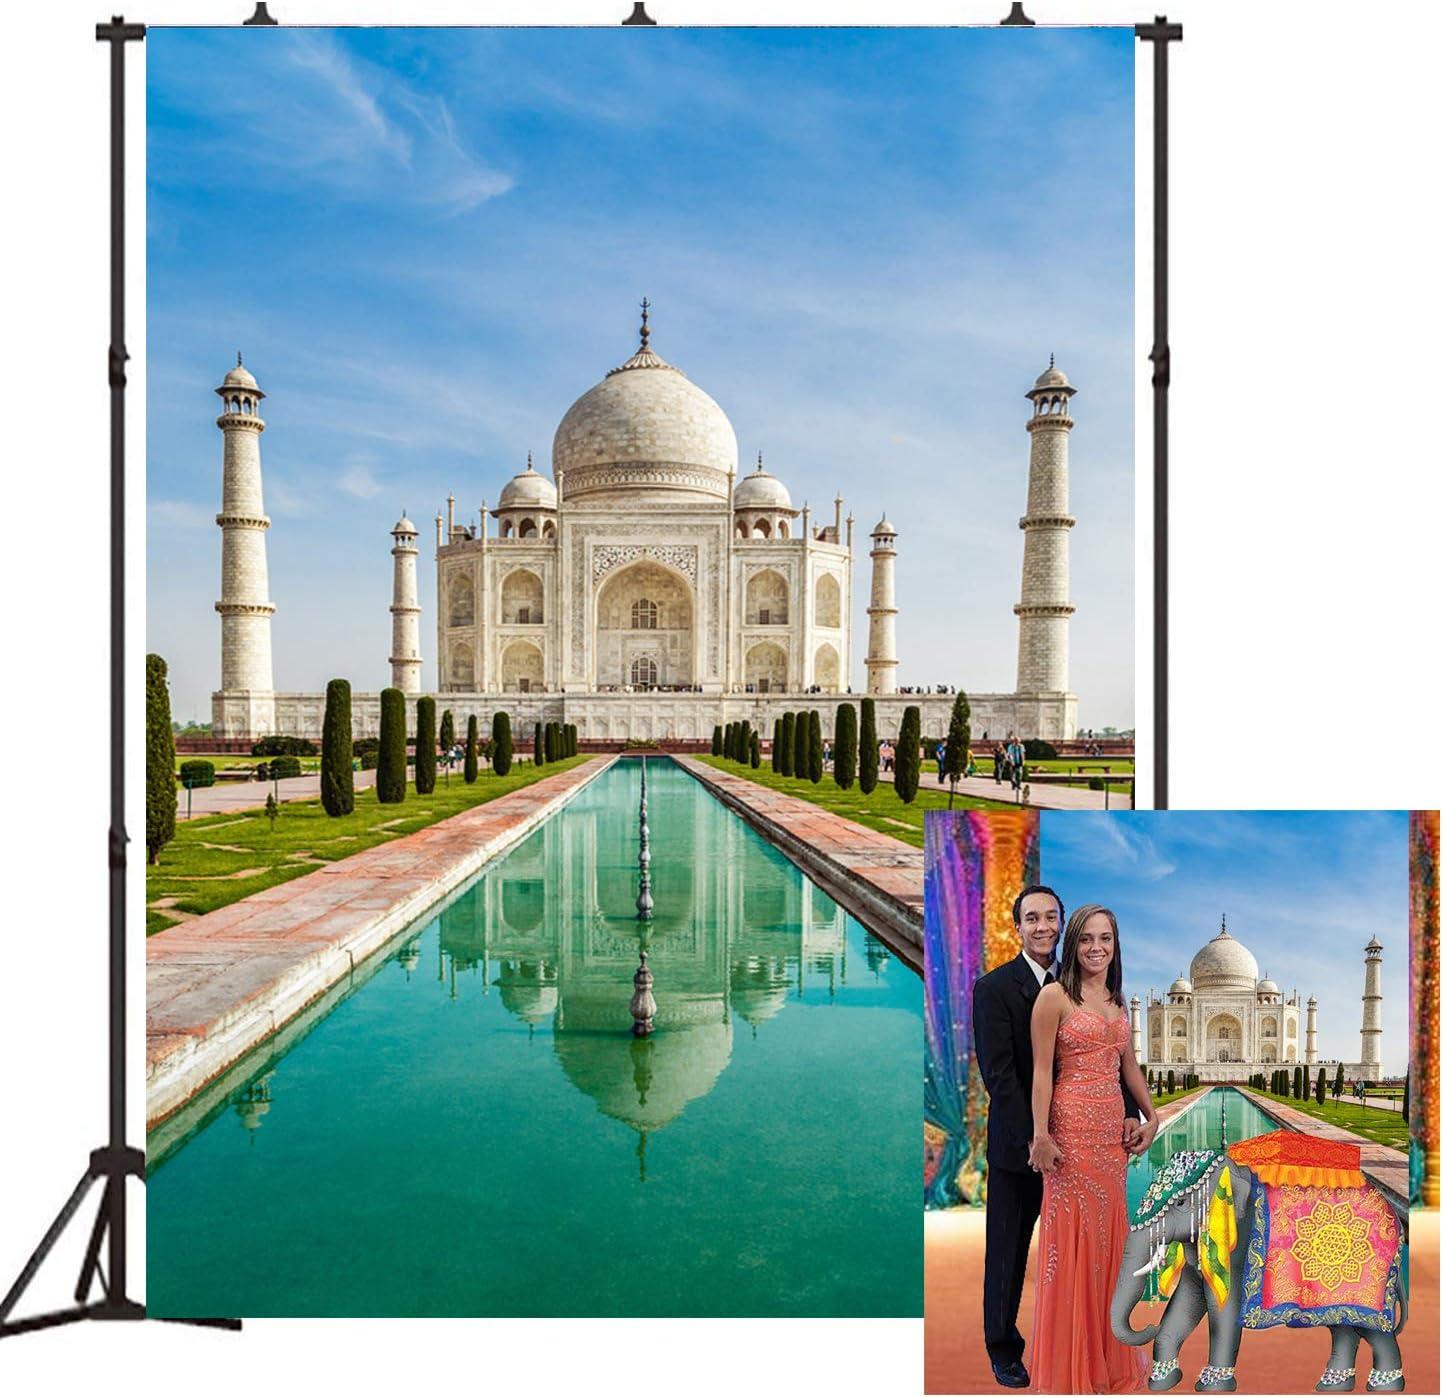 Beautiful Taj Mahal Photo Studio Backdrop 5x7FT India Landmark Light Props Wall Photography Background EY004